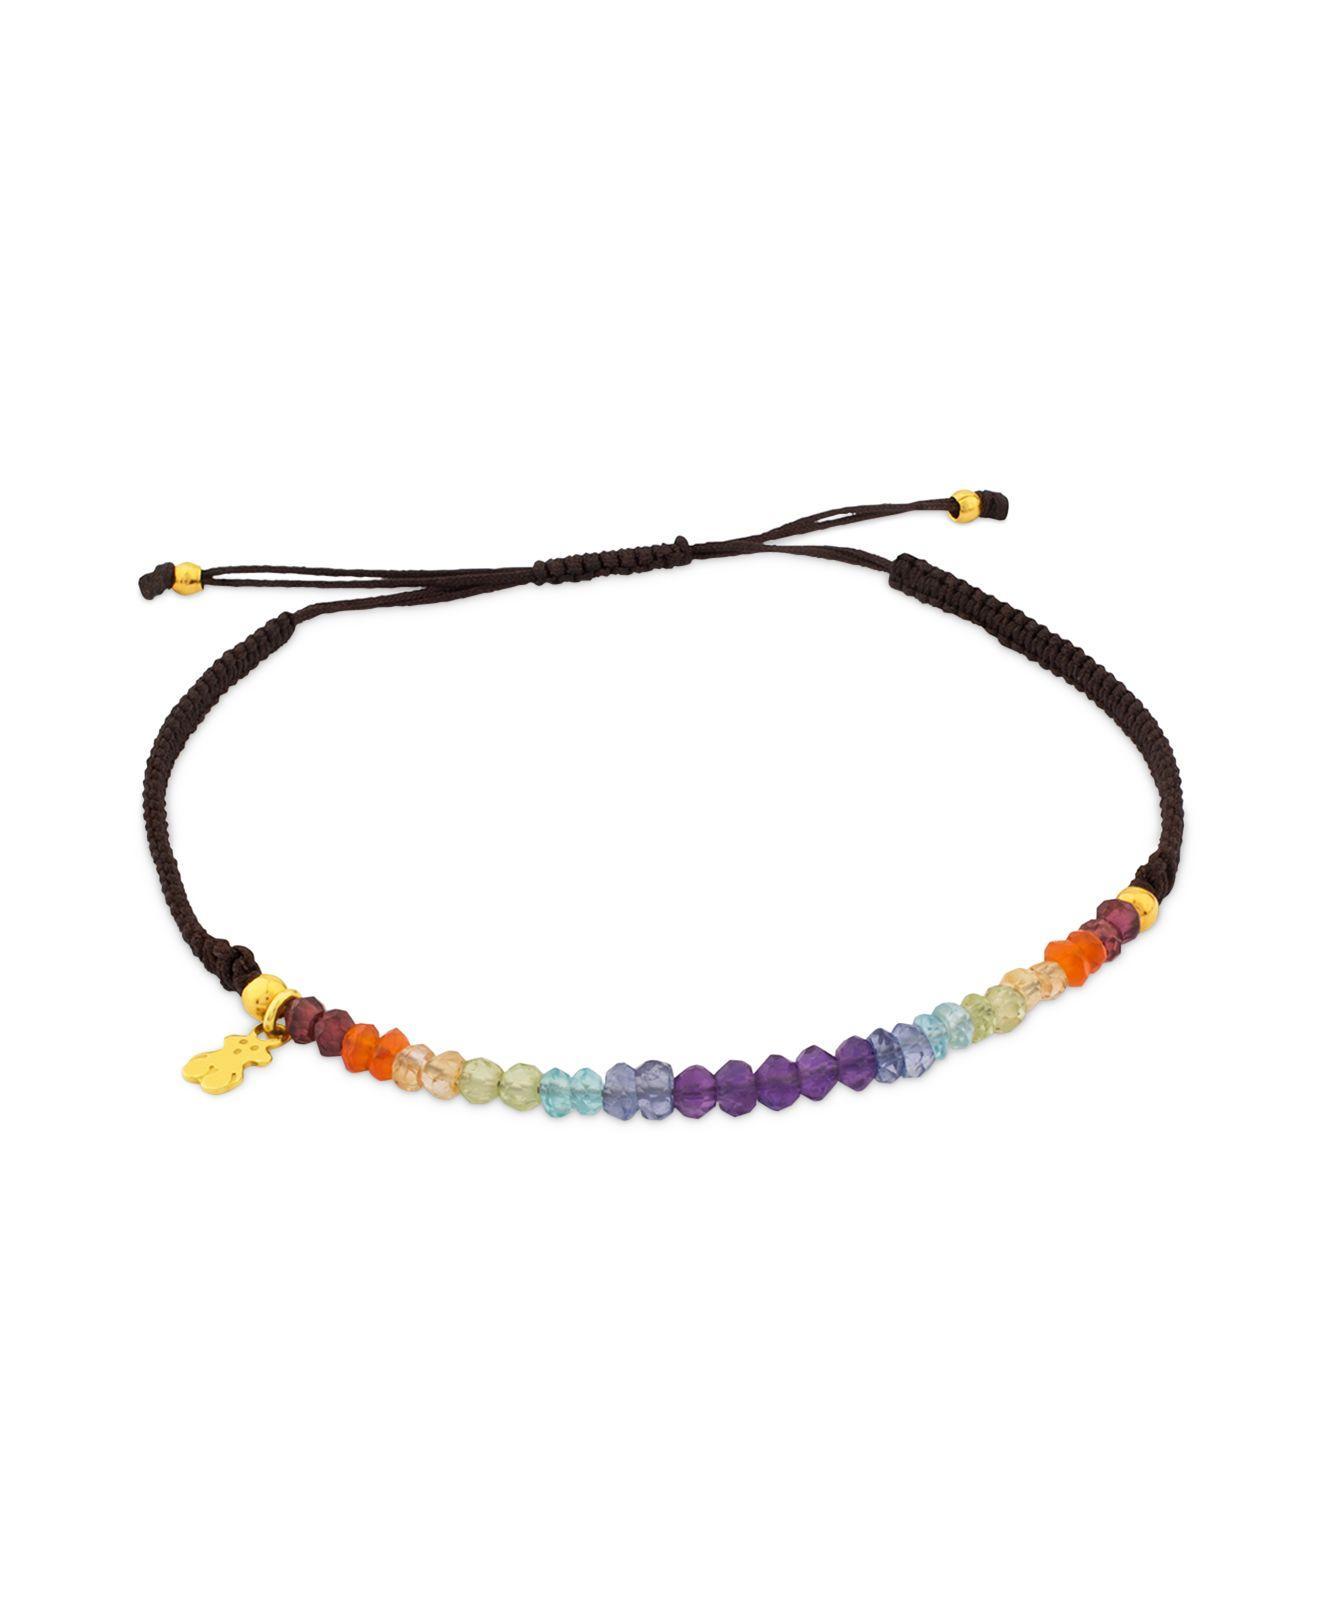 3a099a0372da1 Tous Multicolor Rainbow Multi Stone Knotted Cord Bracelet